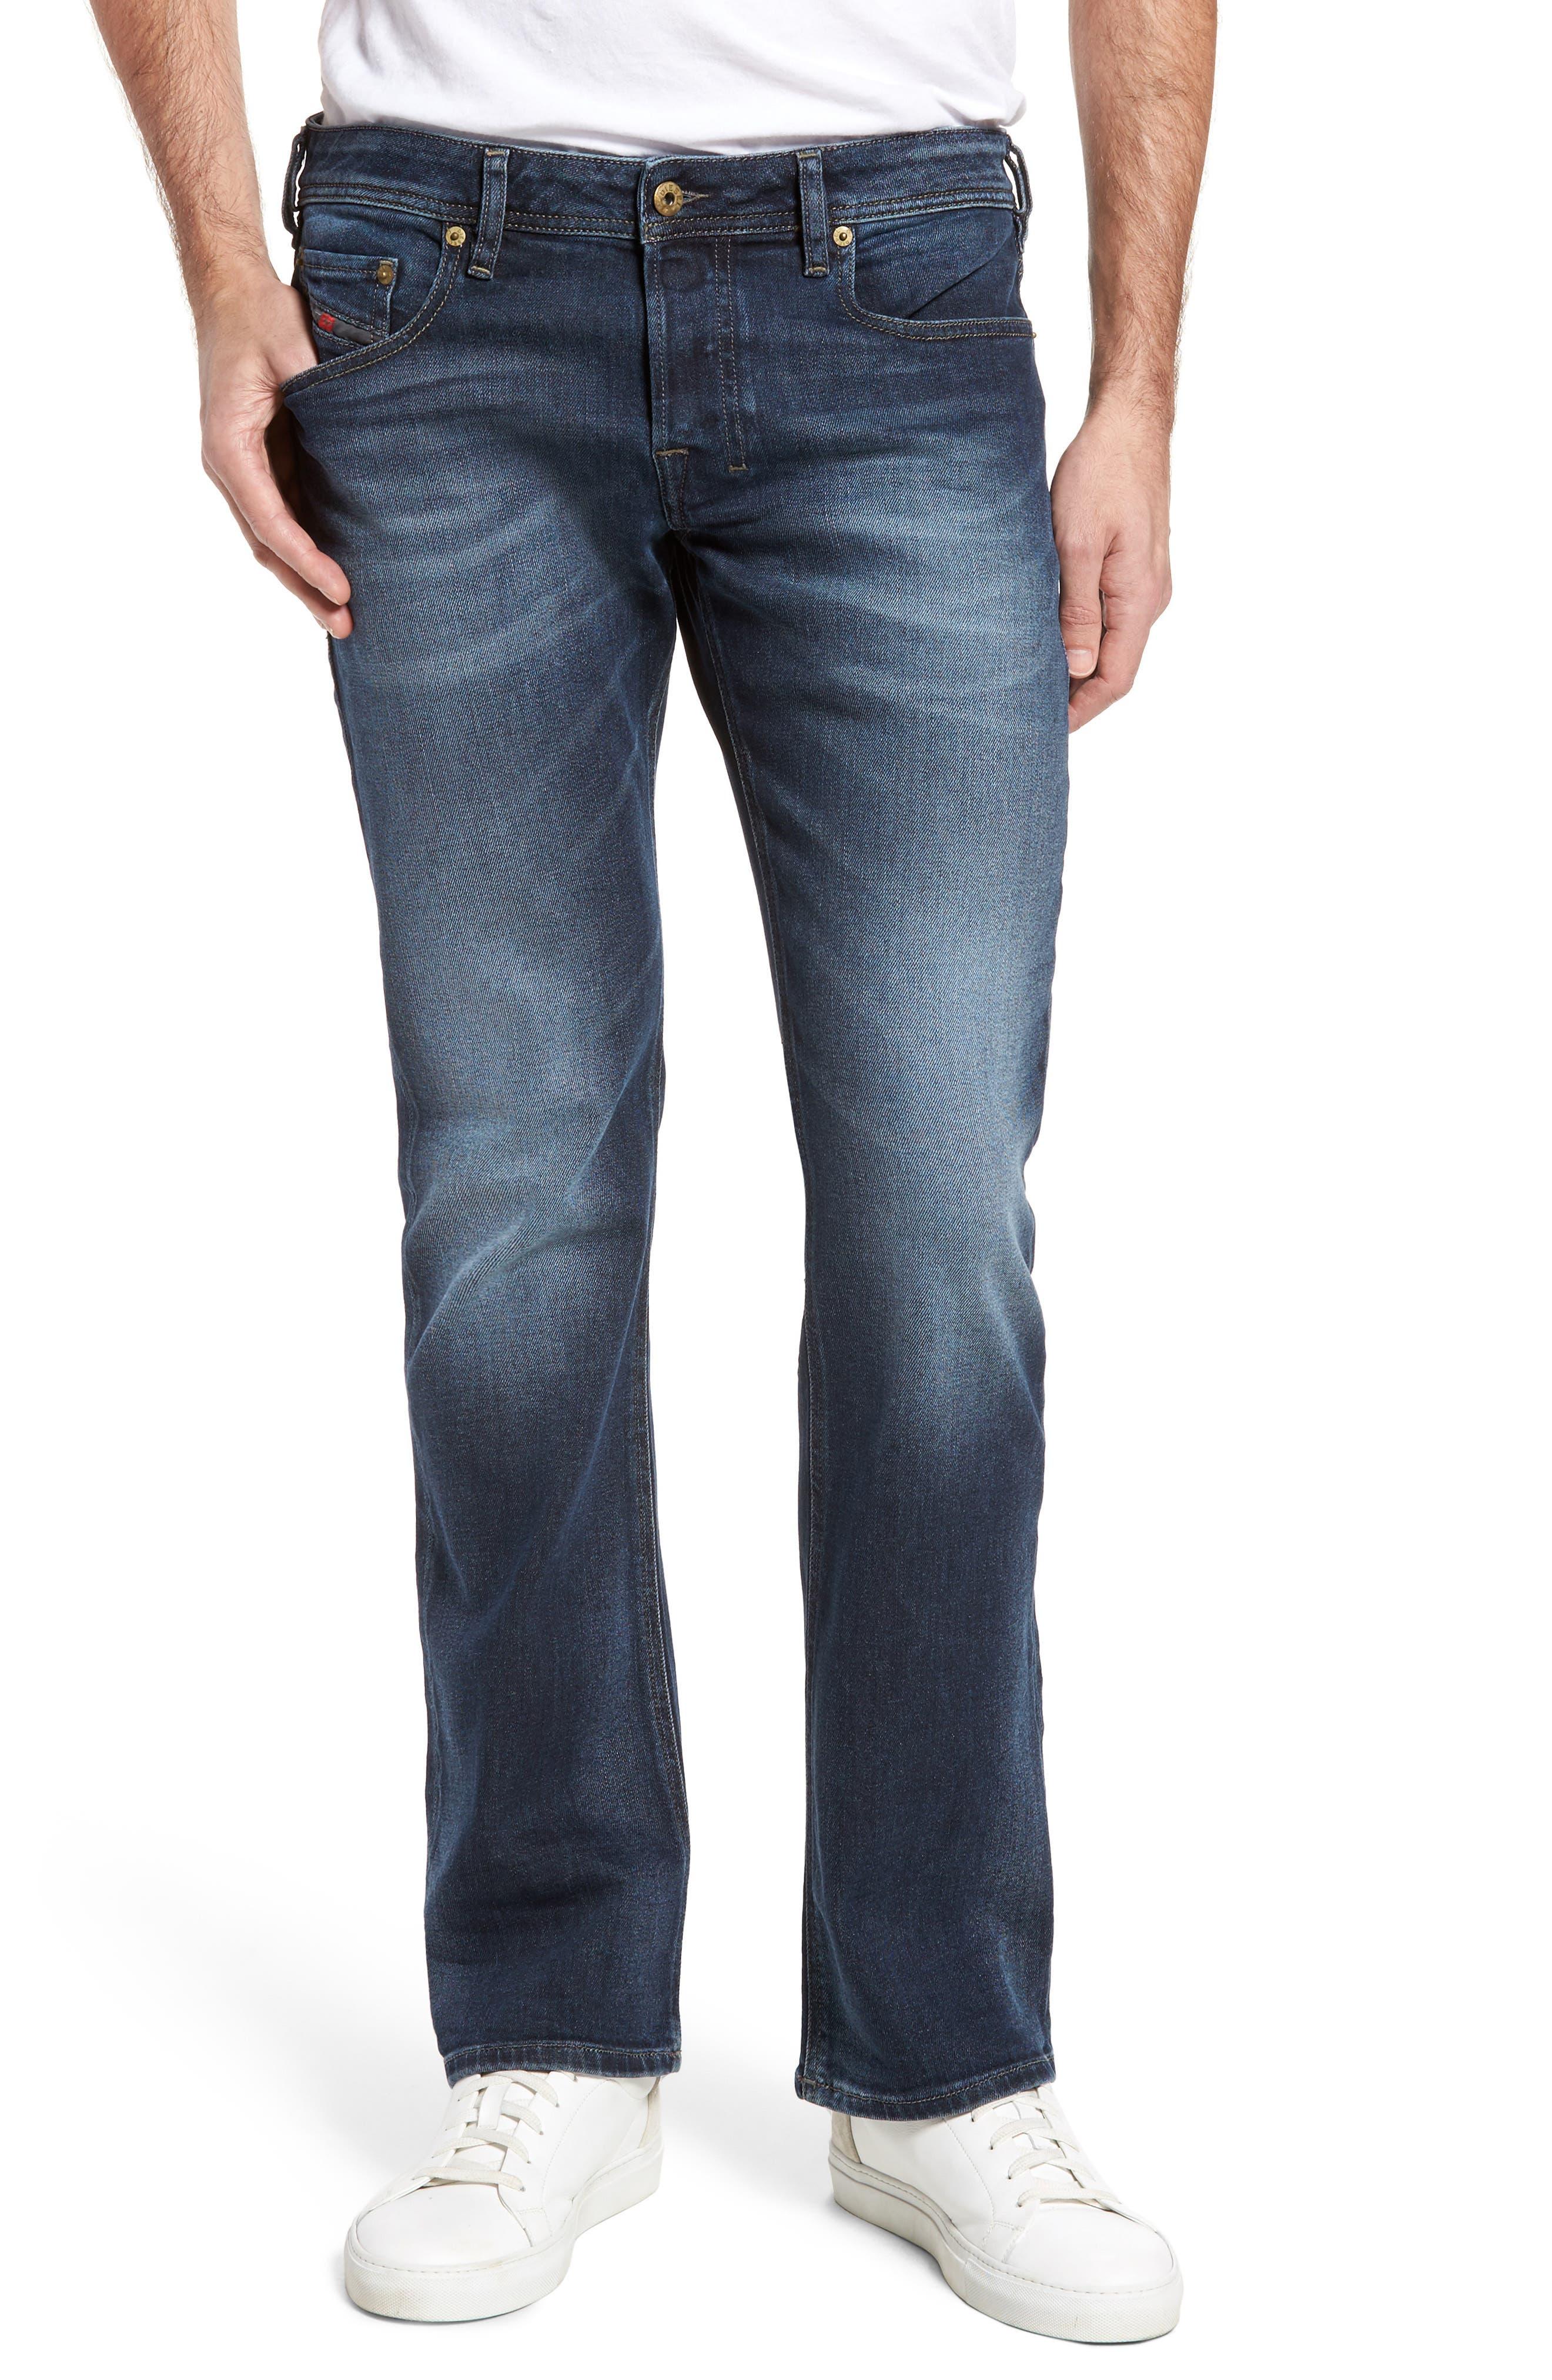 Zatiny Bootcut Jeans,                         Main,                         color, Denim